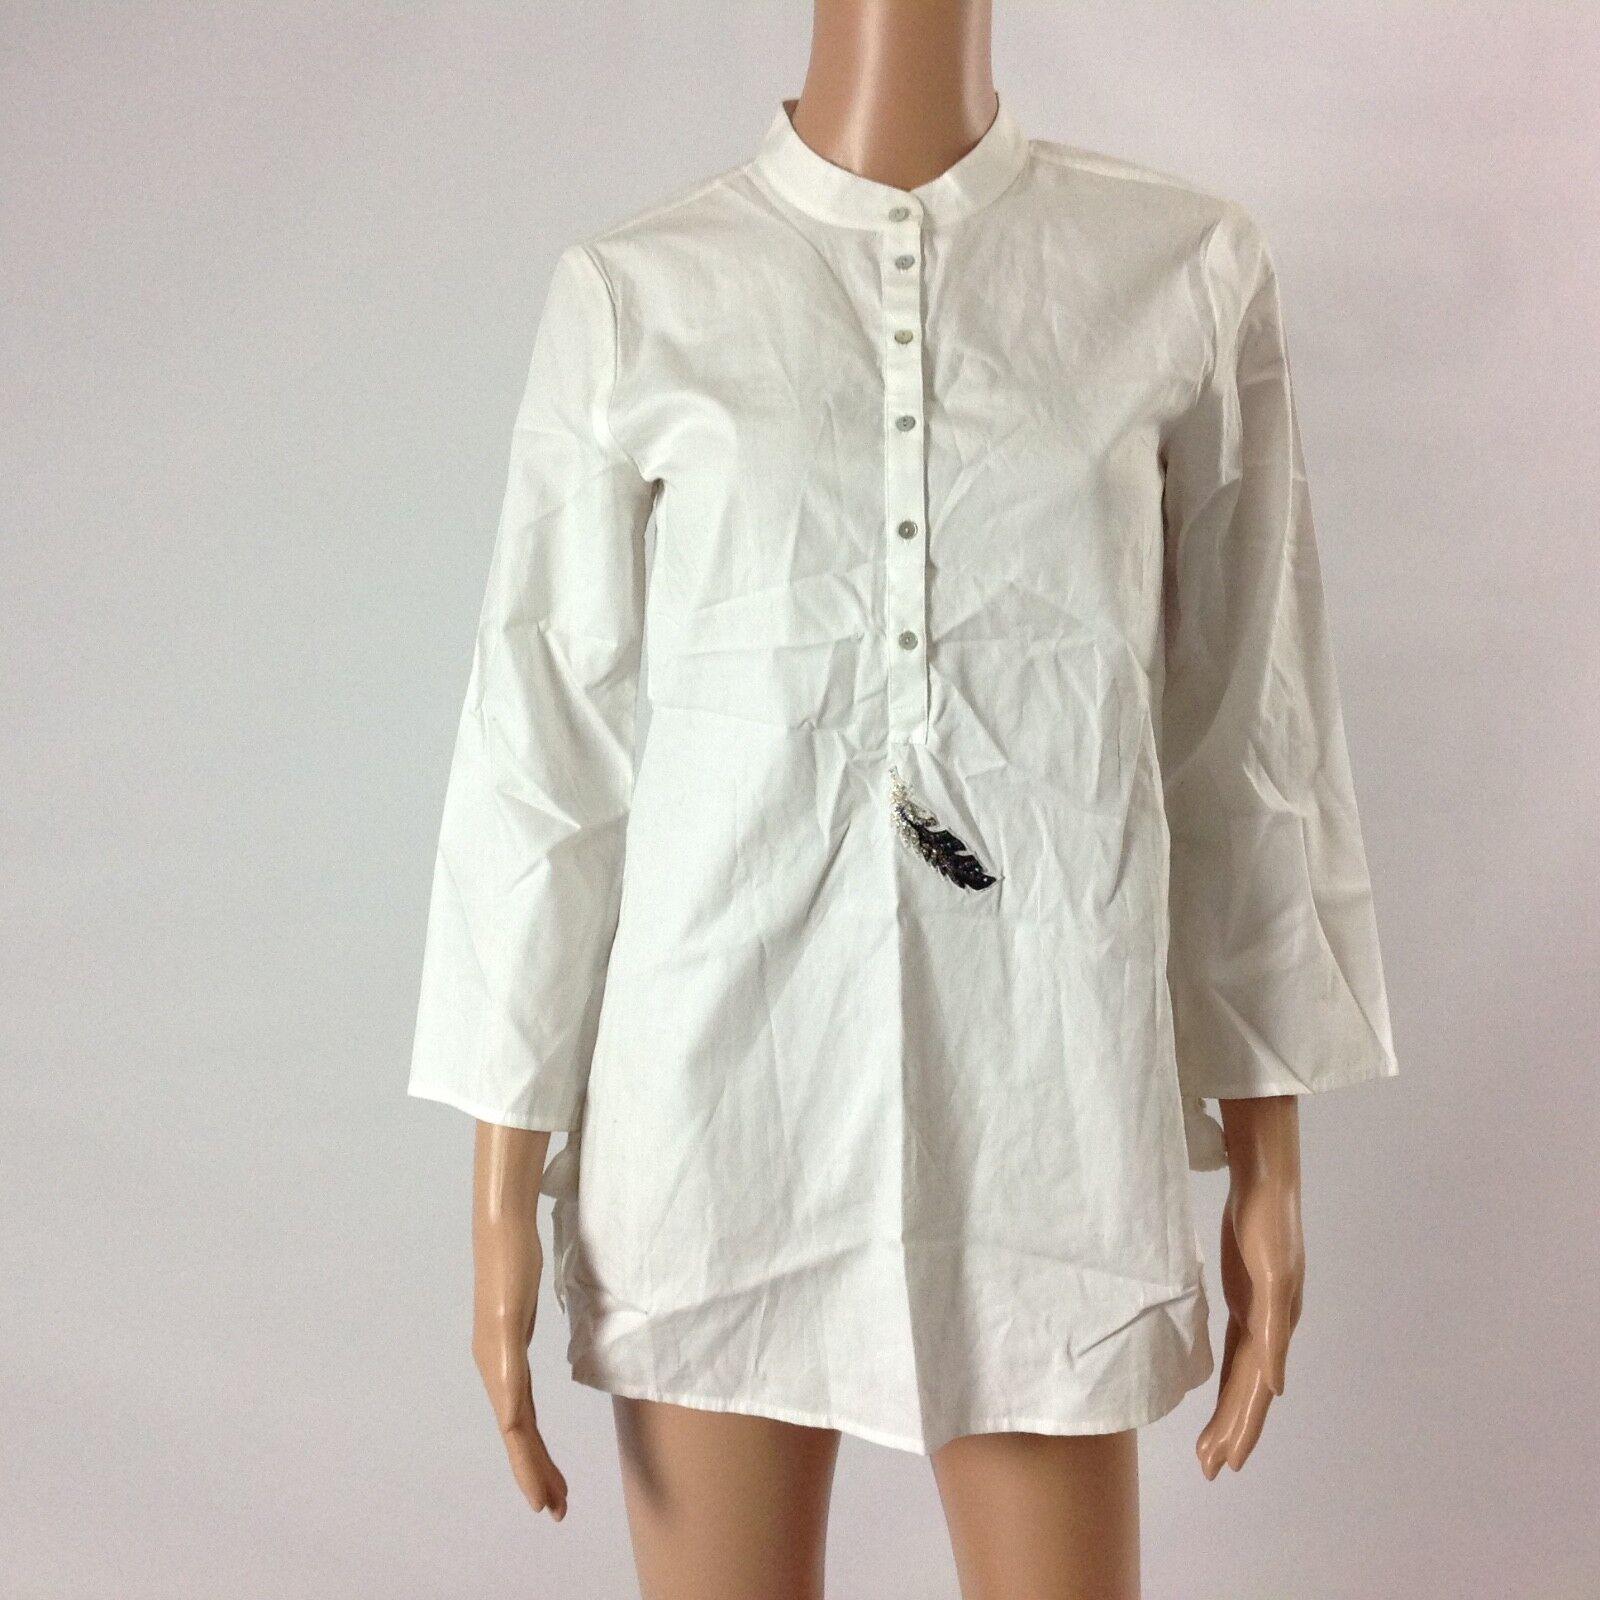 Figue Woherren Shirt Boho Hippy Feather Embellished Beaded Tunic Tassel Sz XS New